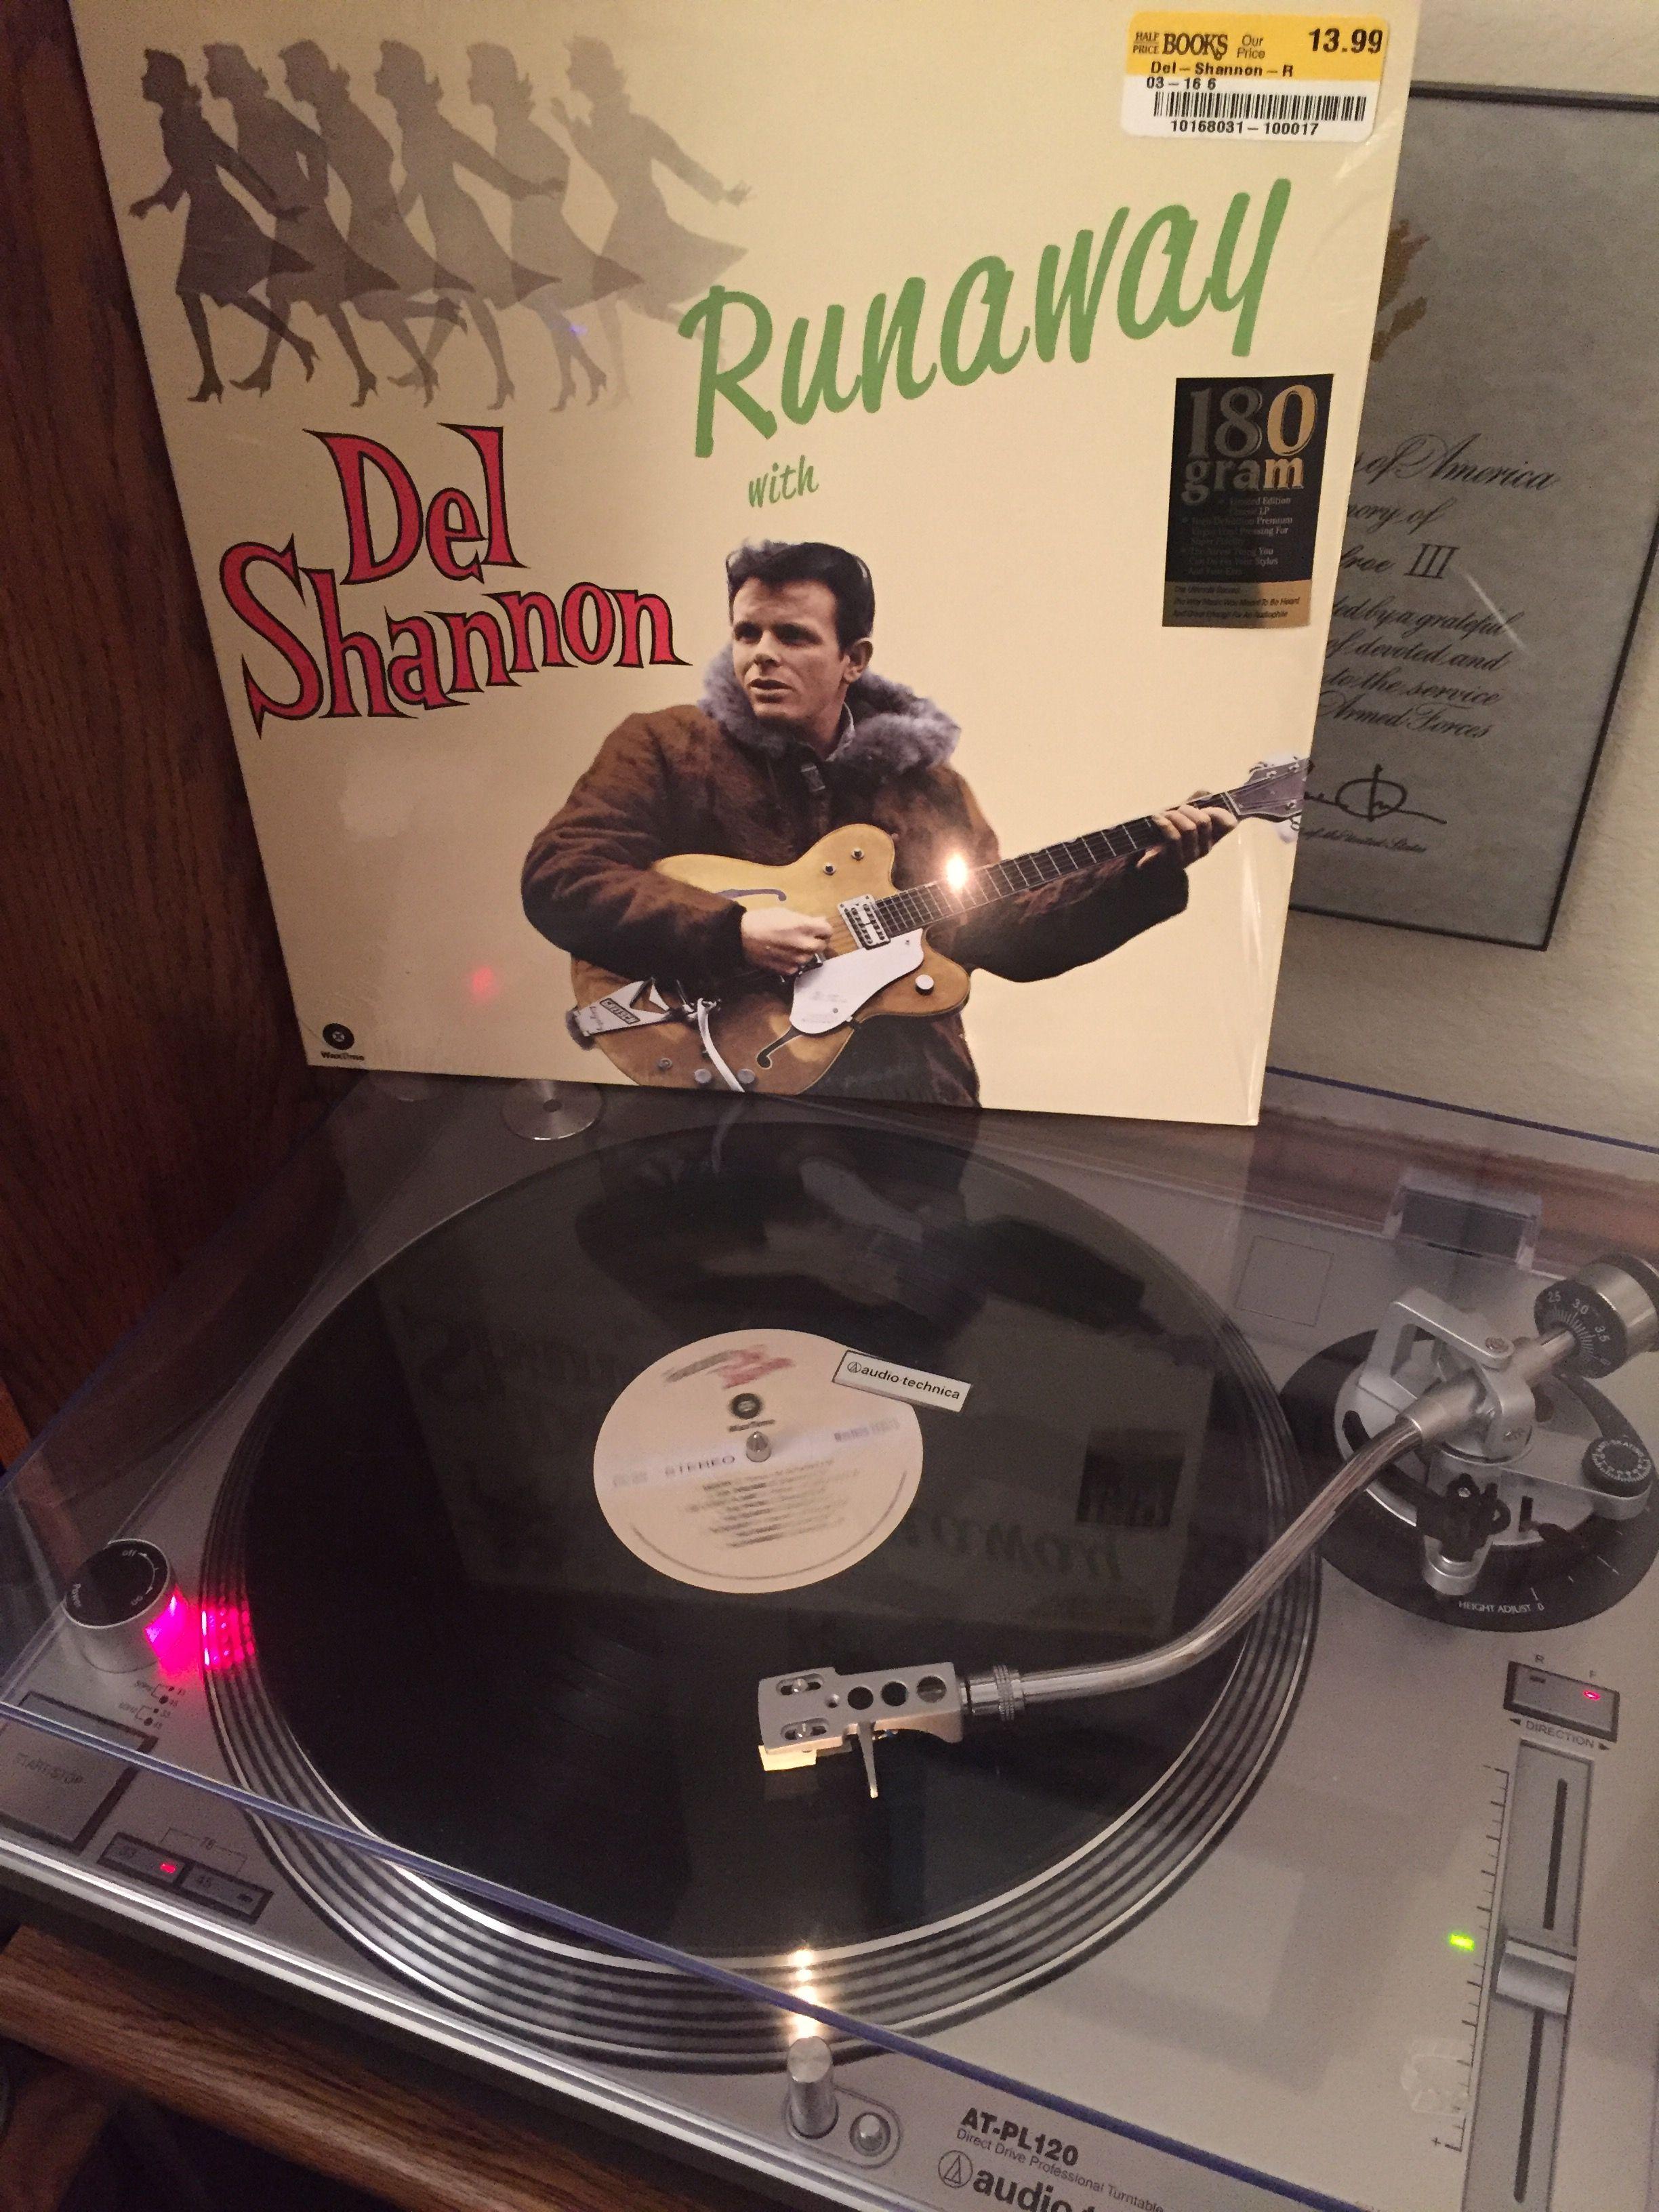 Del Shannon Runaway 1961 Waxtime 772106 Reissued 2015 180g Vinyl Del Shannon Runaway Del Shannon Music Record